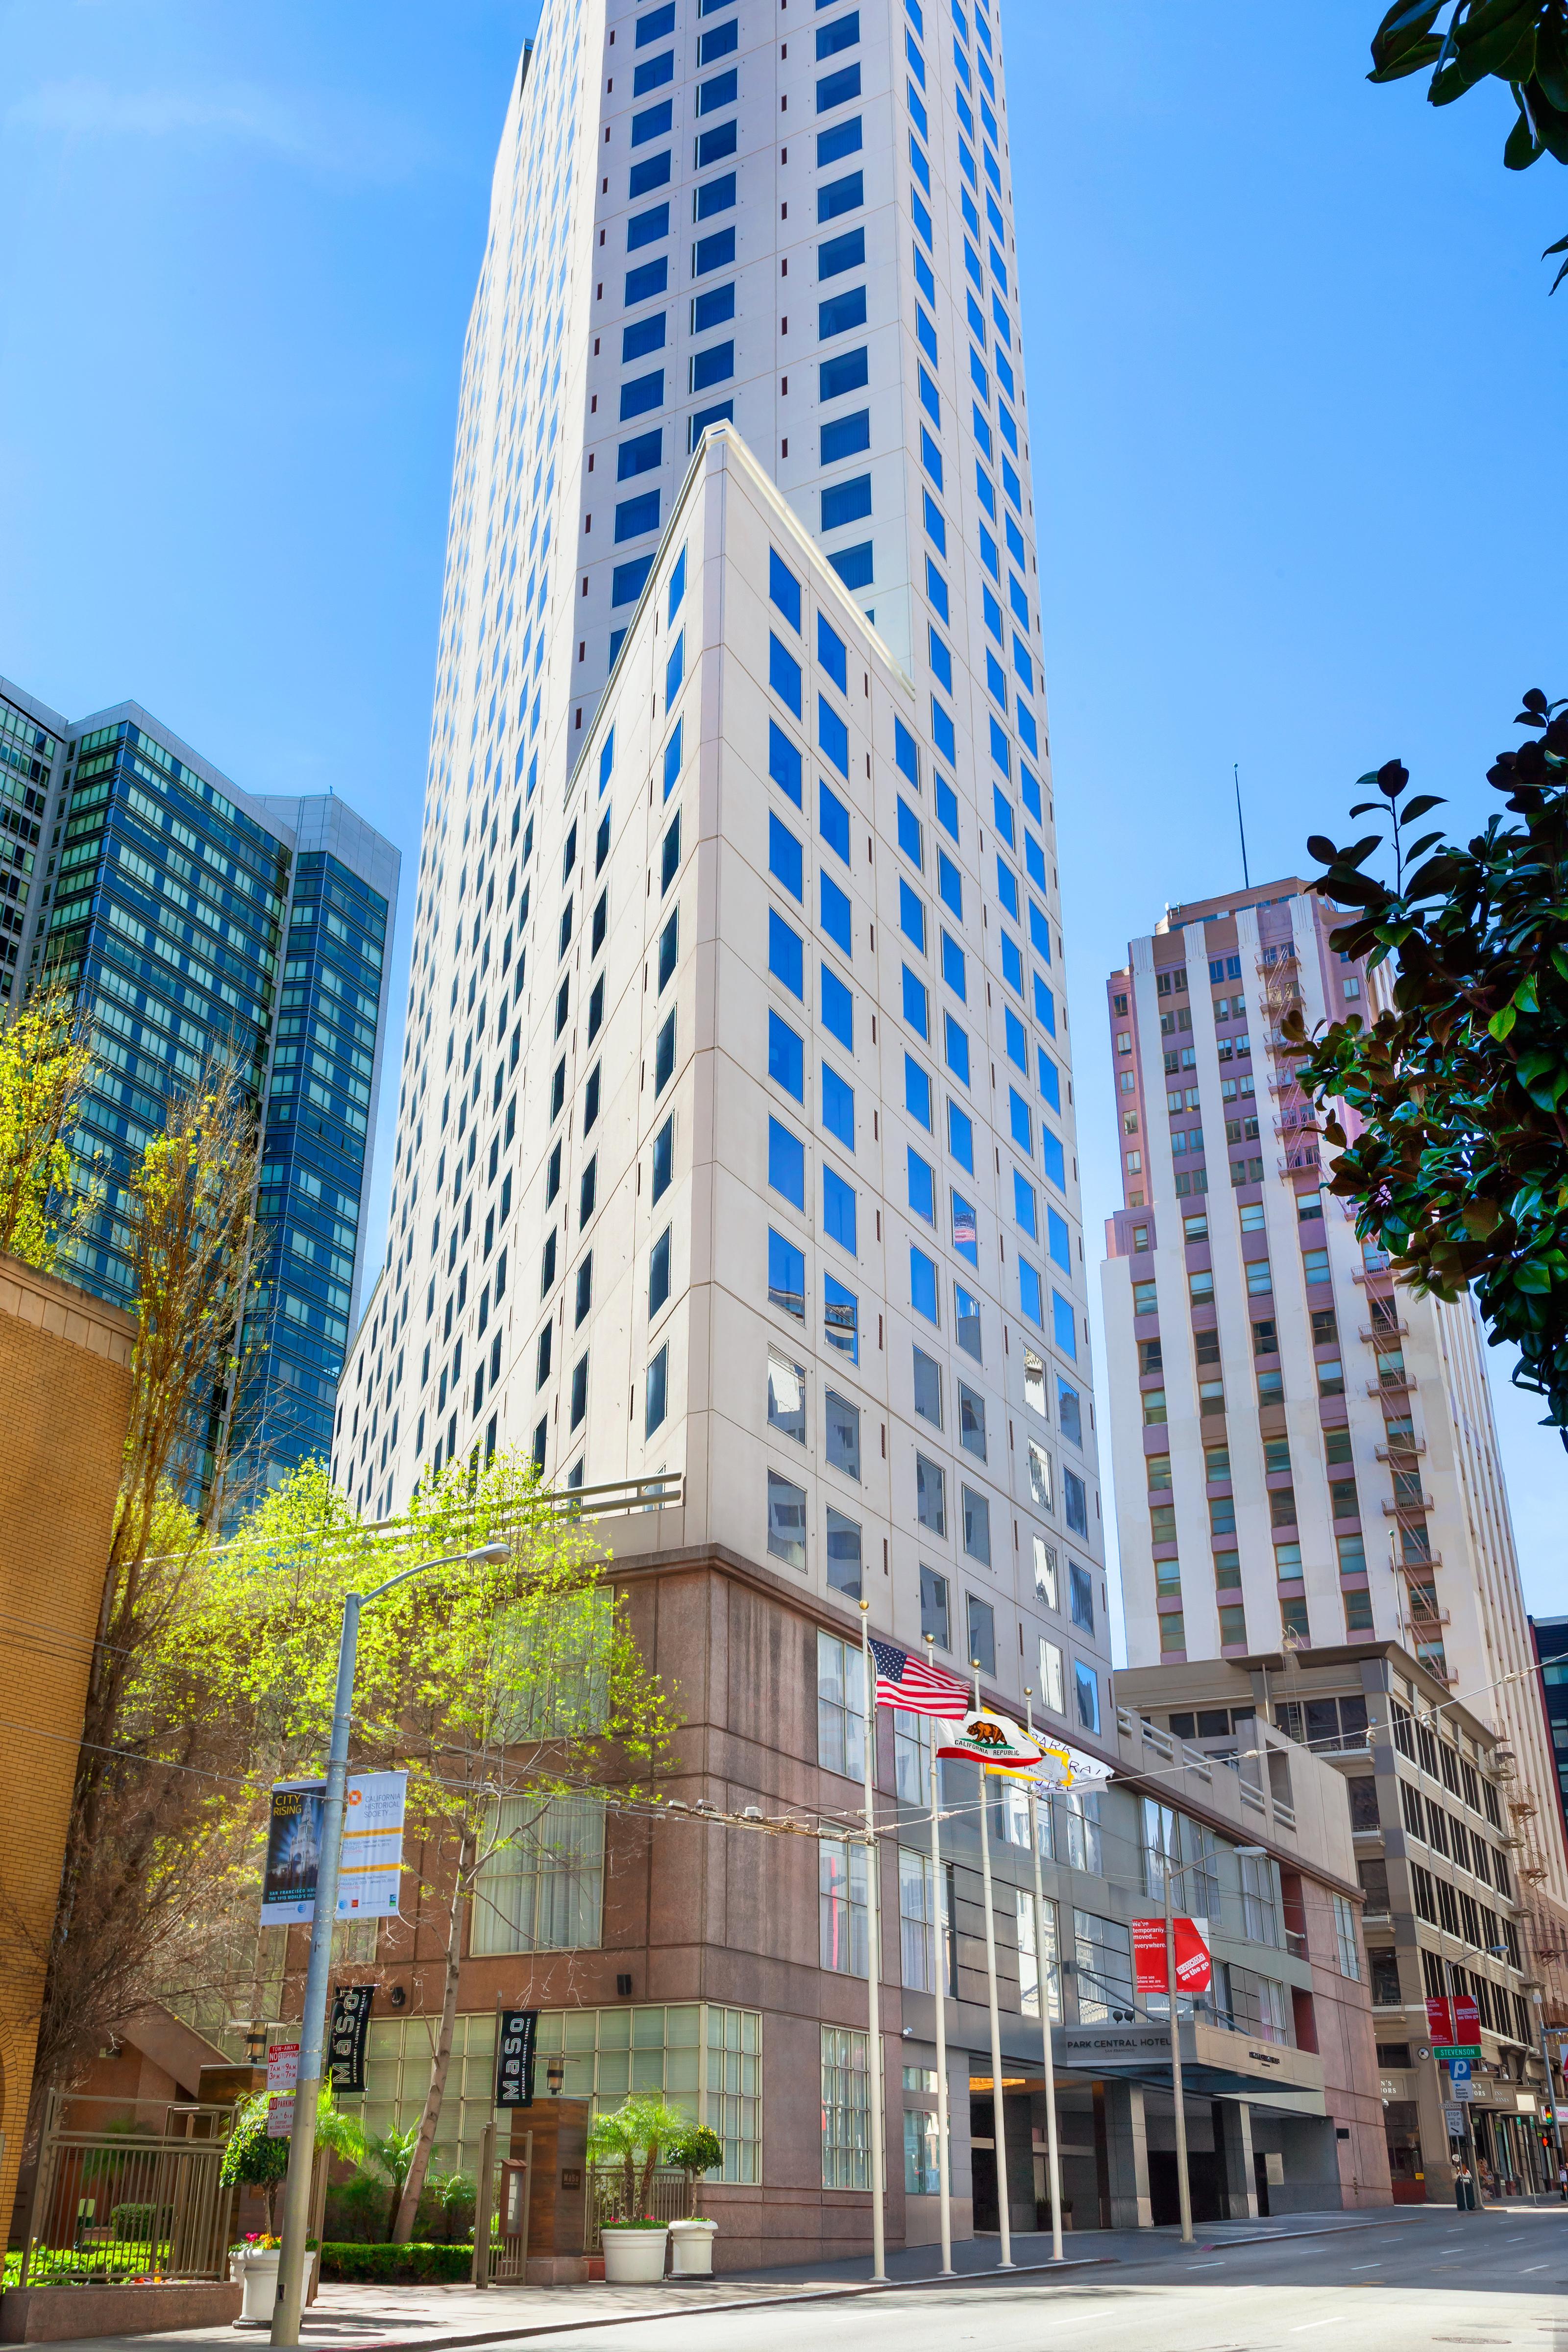 Hyatt Announces Plans For A New Hyatt Regency Hotel In San Francisco Business Wire